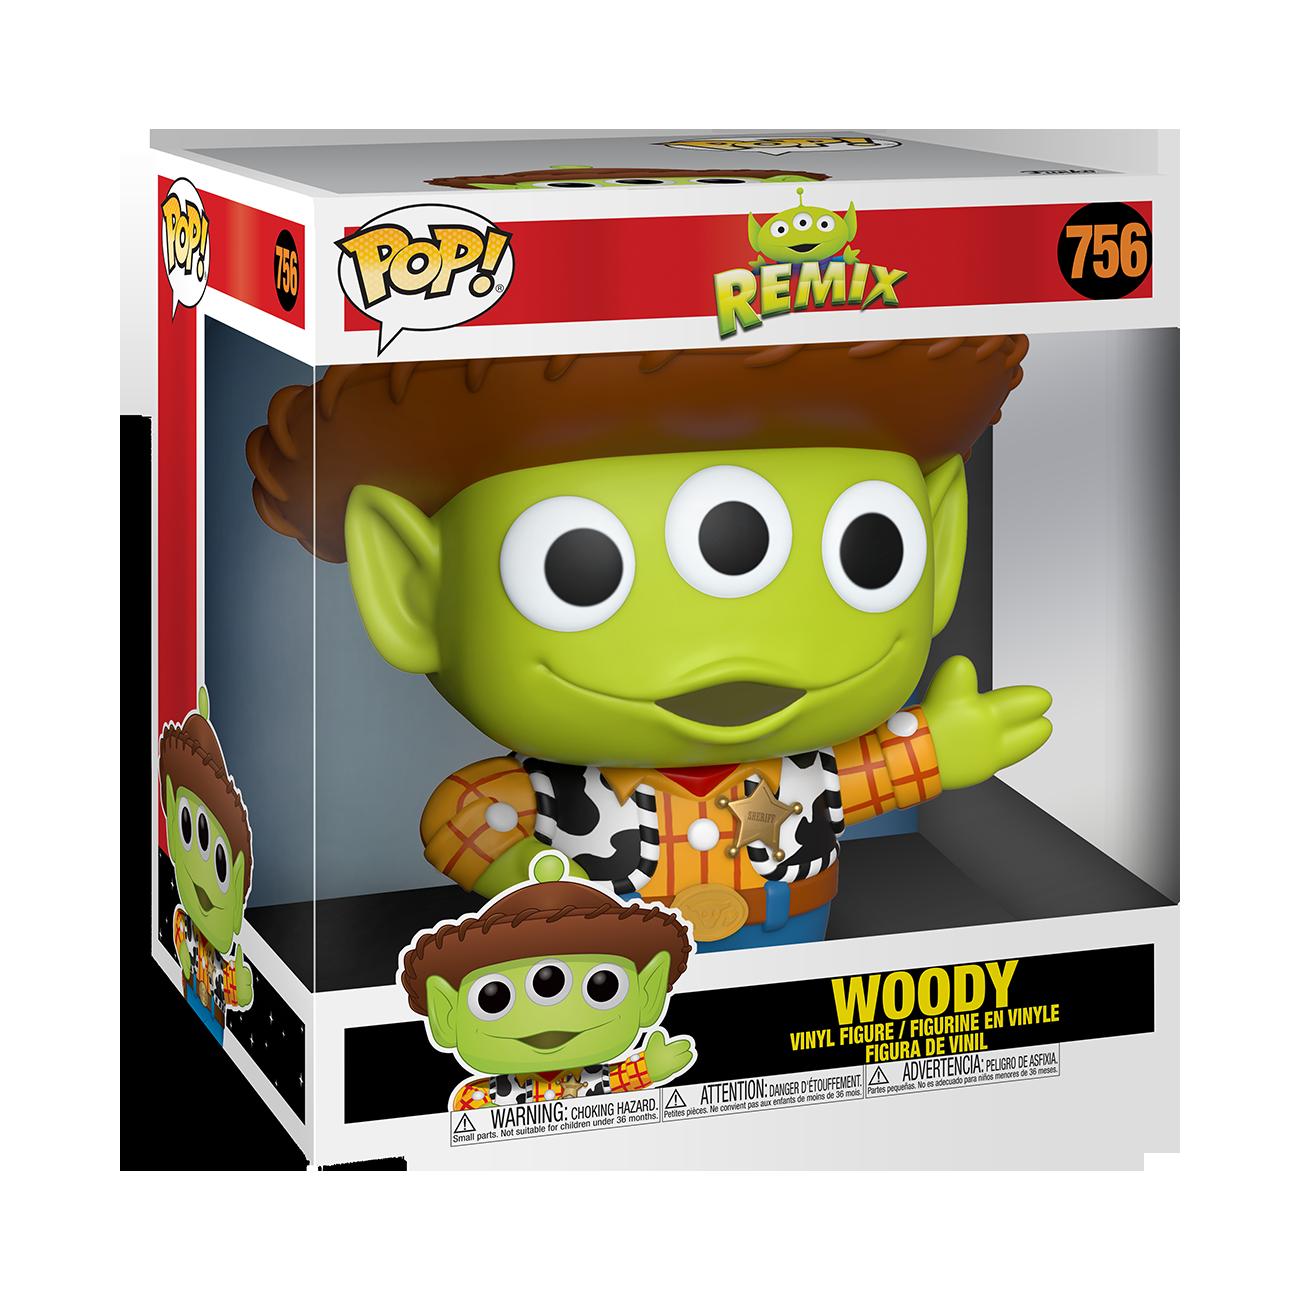 "PRE-ORDER Funko Disney: Pixar Alien Remix as Woody 10"" Vinyl Figure"